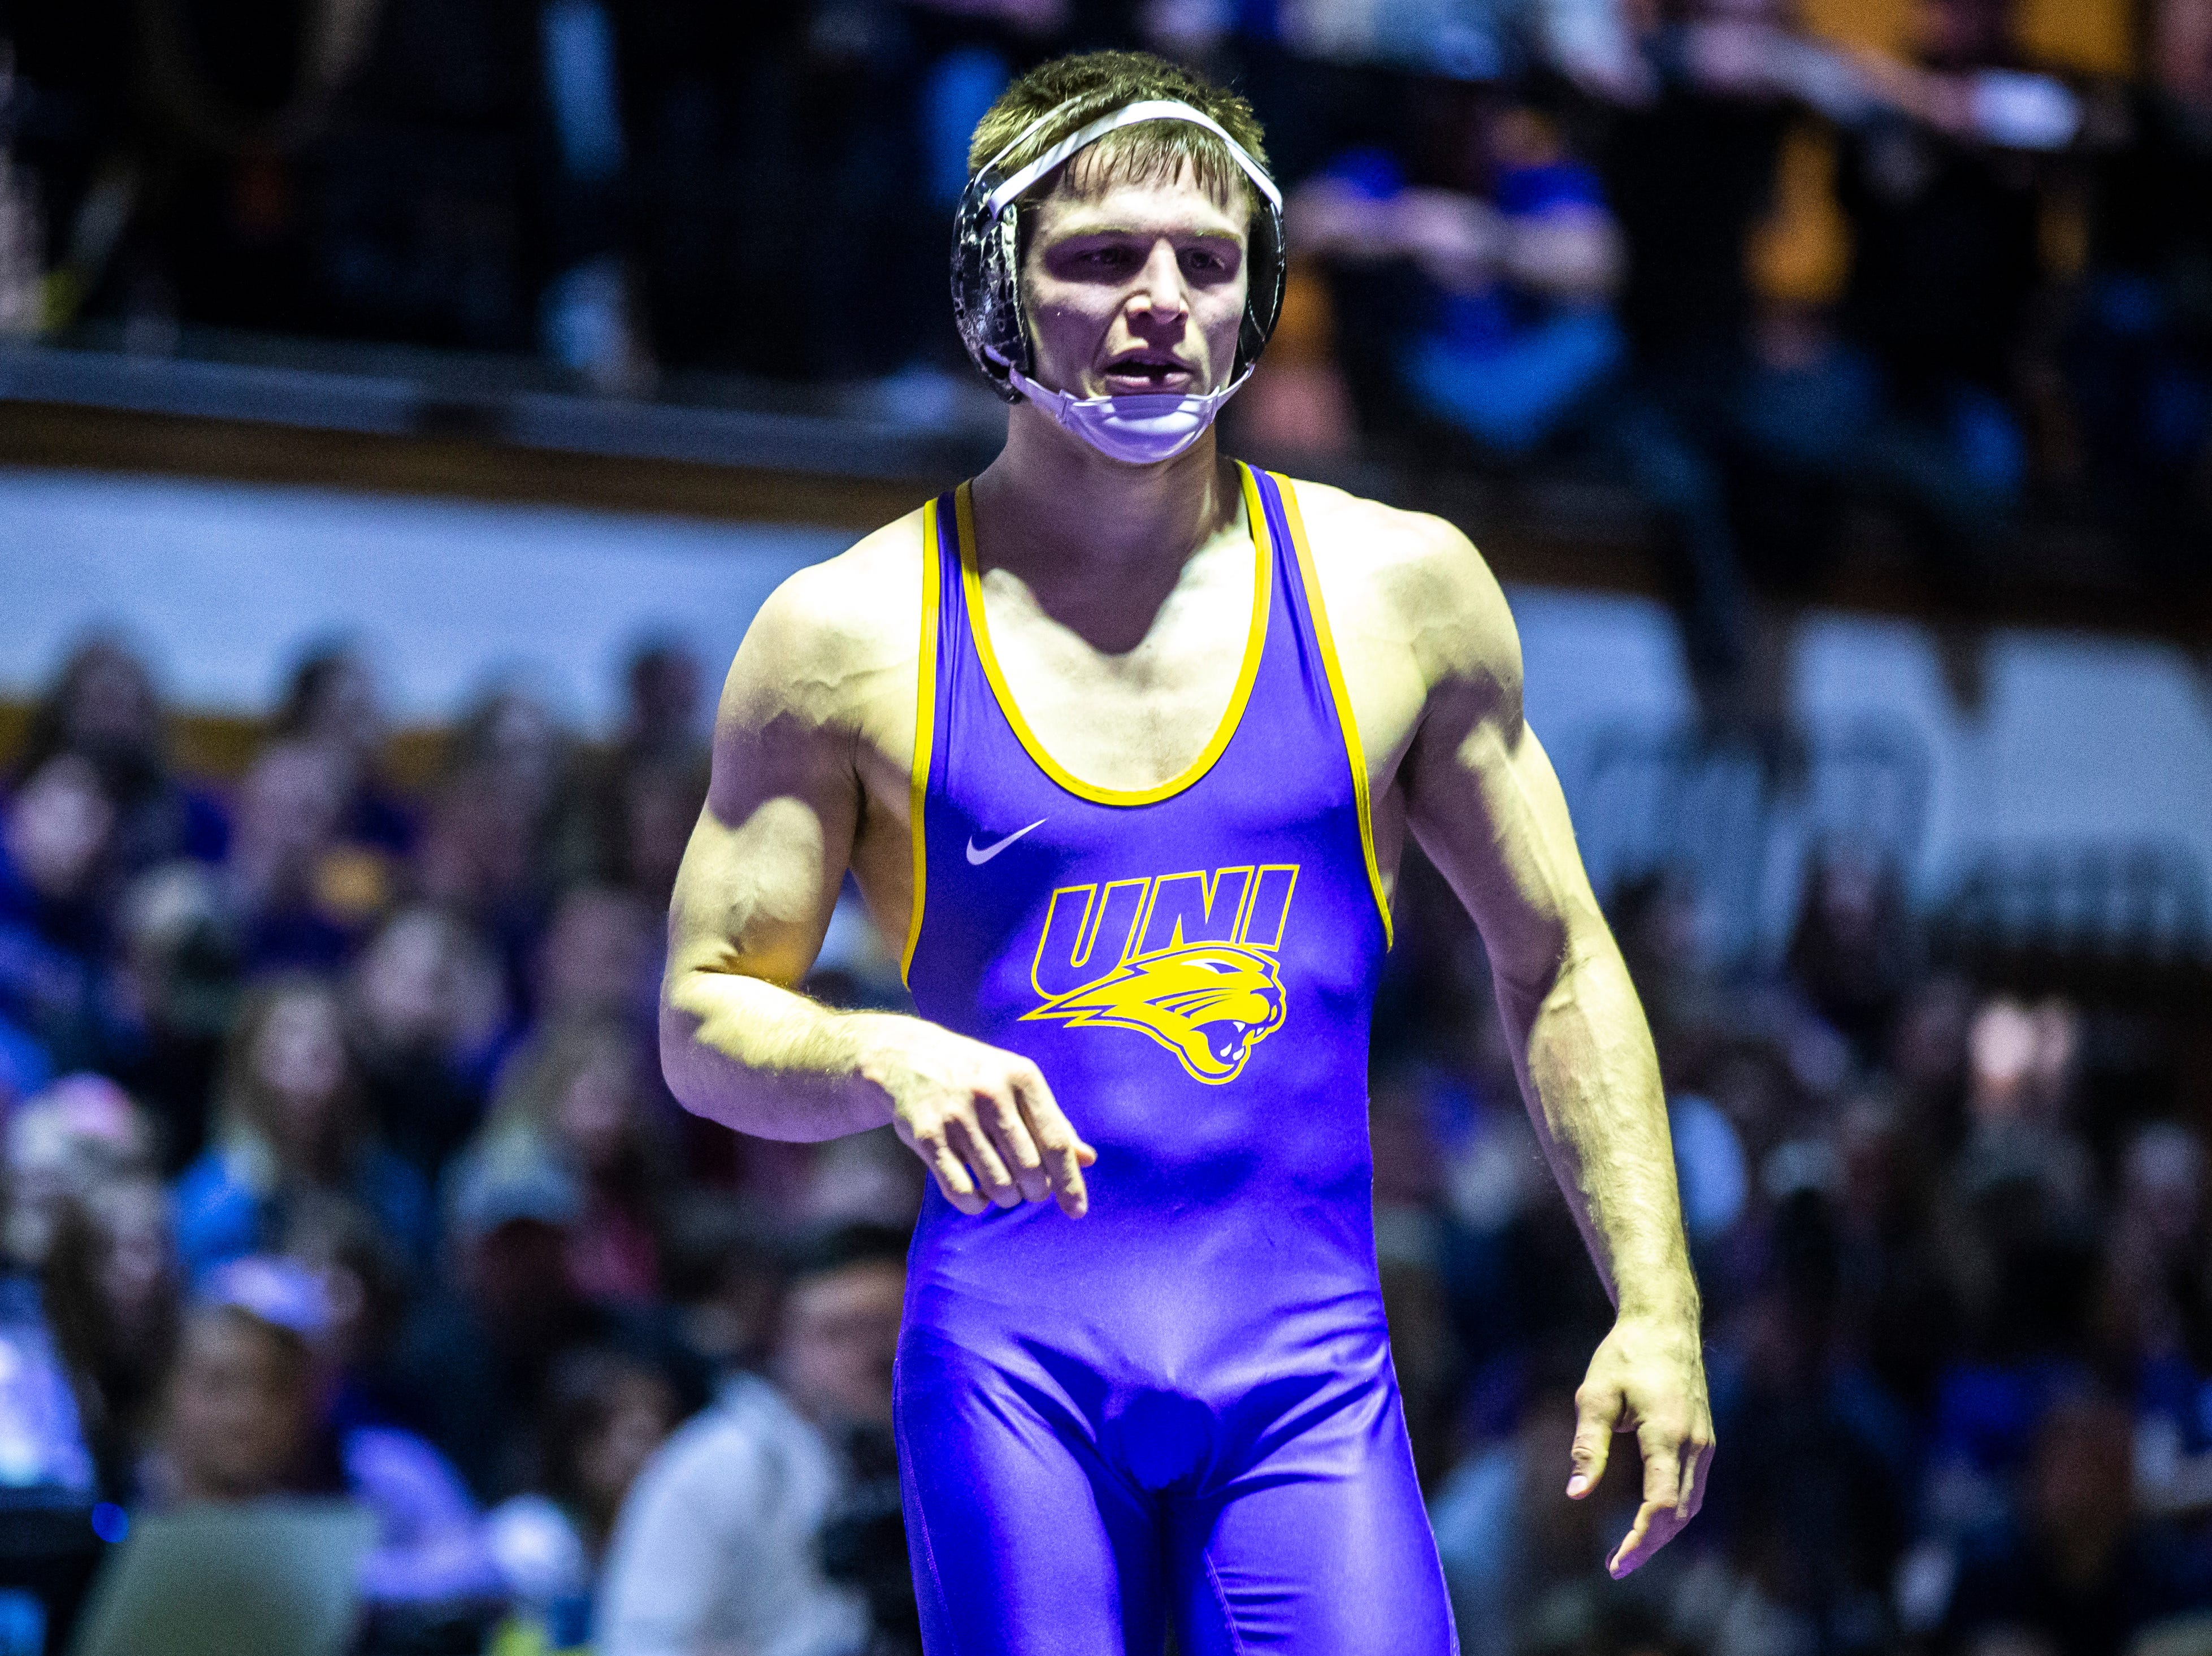 Northern Iowa's Max Thomsen wrestles Iowa State's Jarrett Degen at 149 during a NCAA Big 12 wrestling dual on Thursday, Feb. 21, 2019 at the West Gymnasium in Cedar Falls, Iowa.